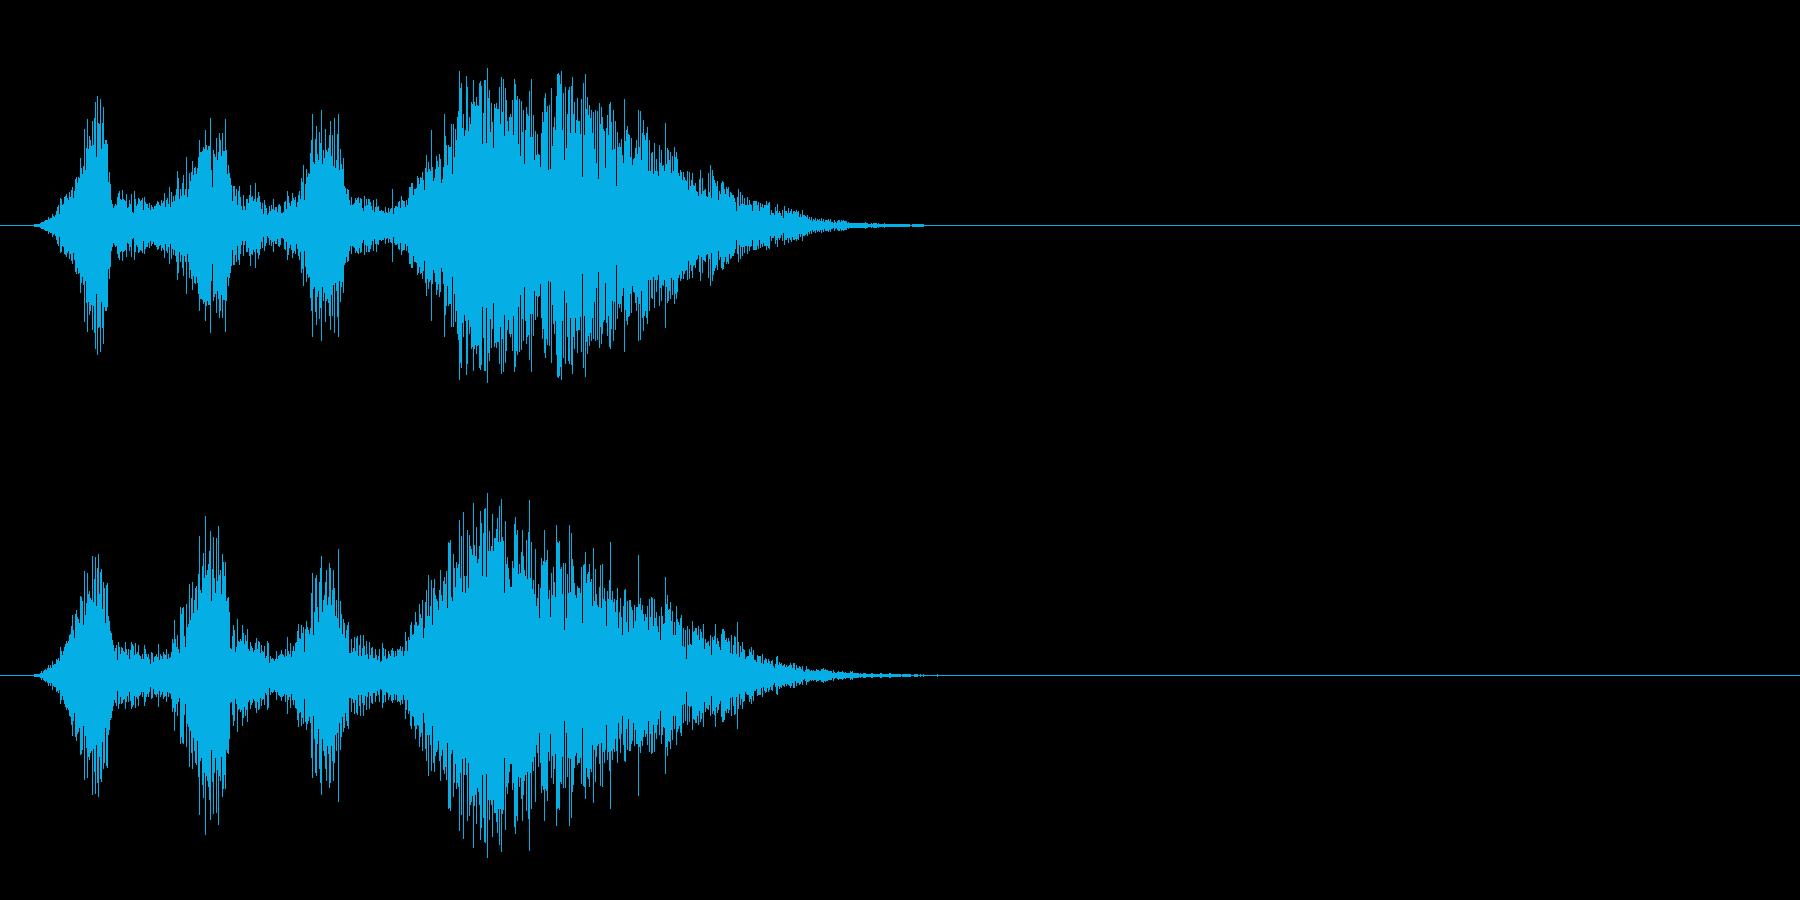 SE系/場面転換ジングルの再生済みの波形